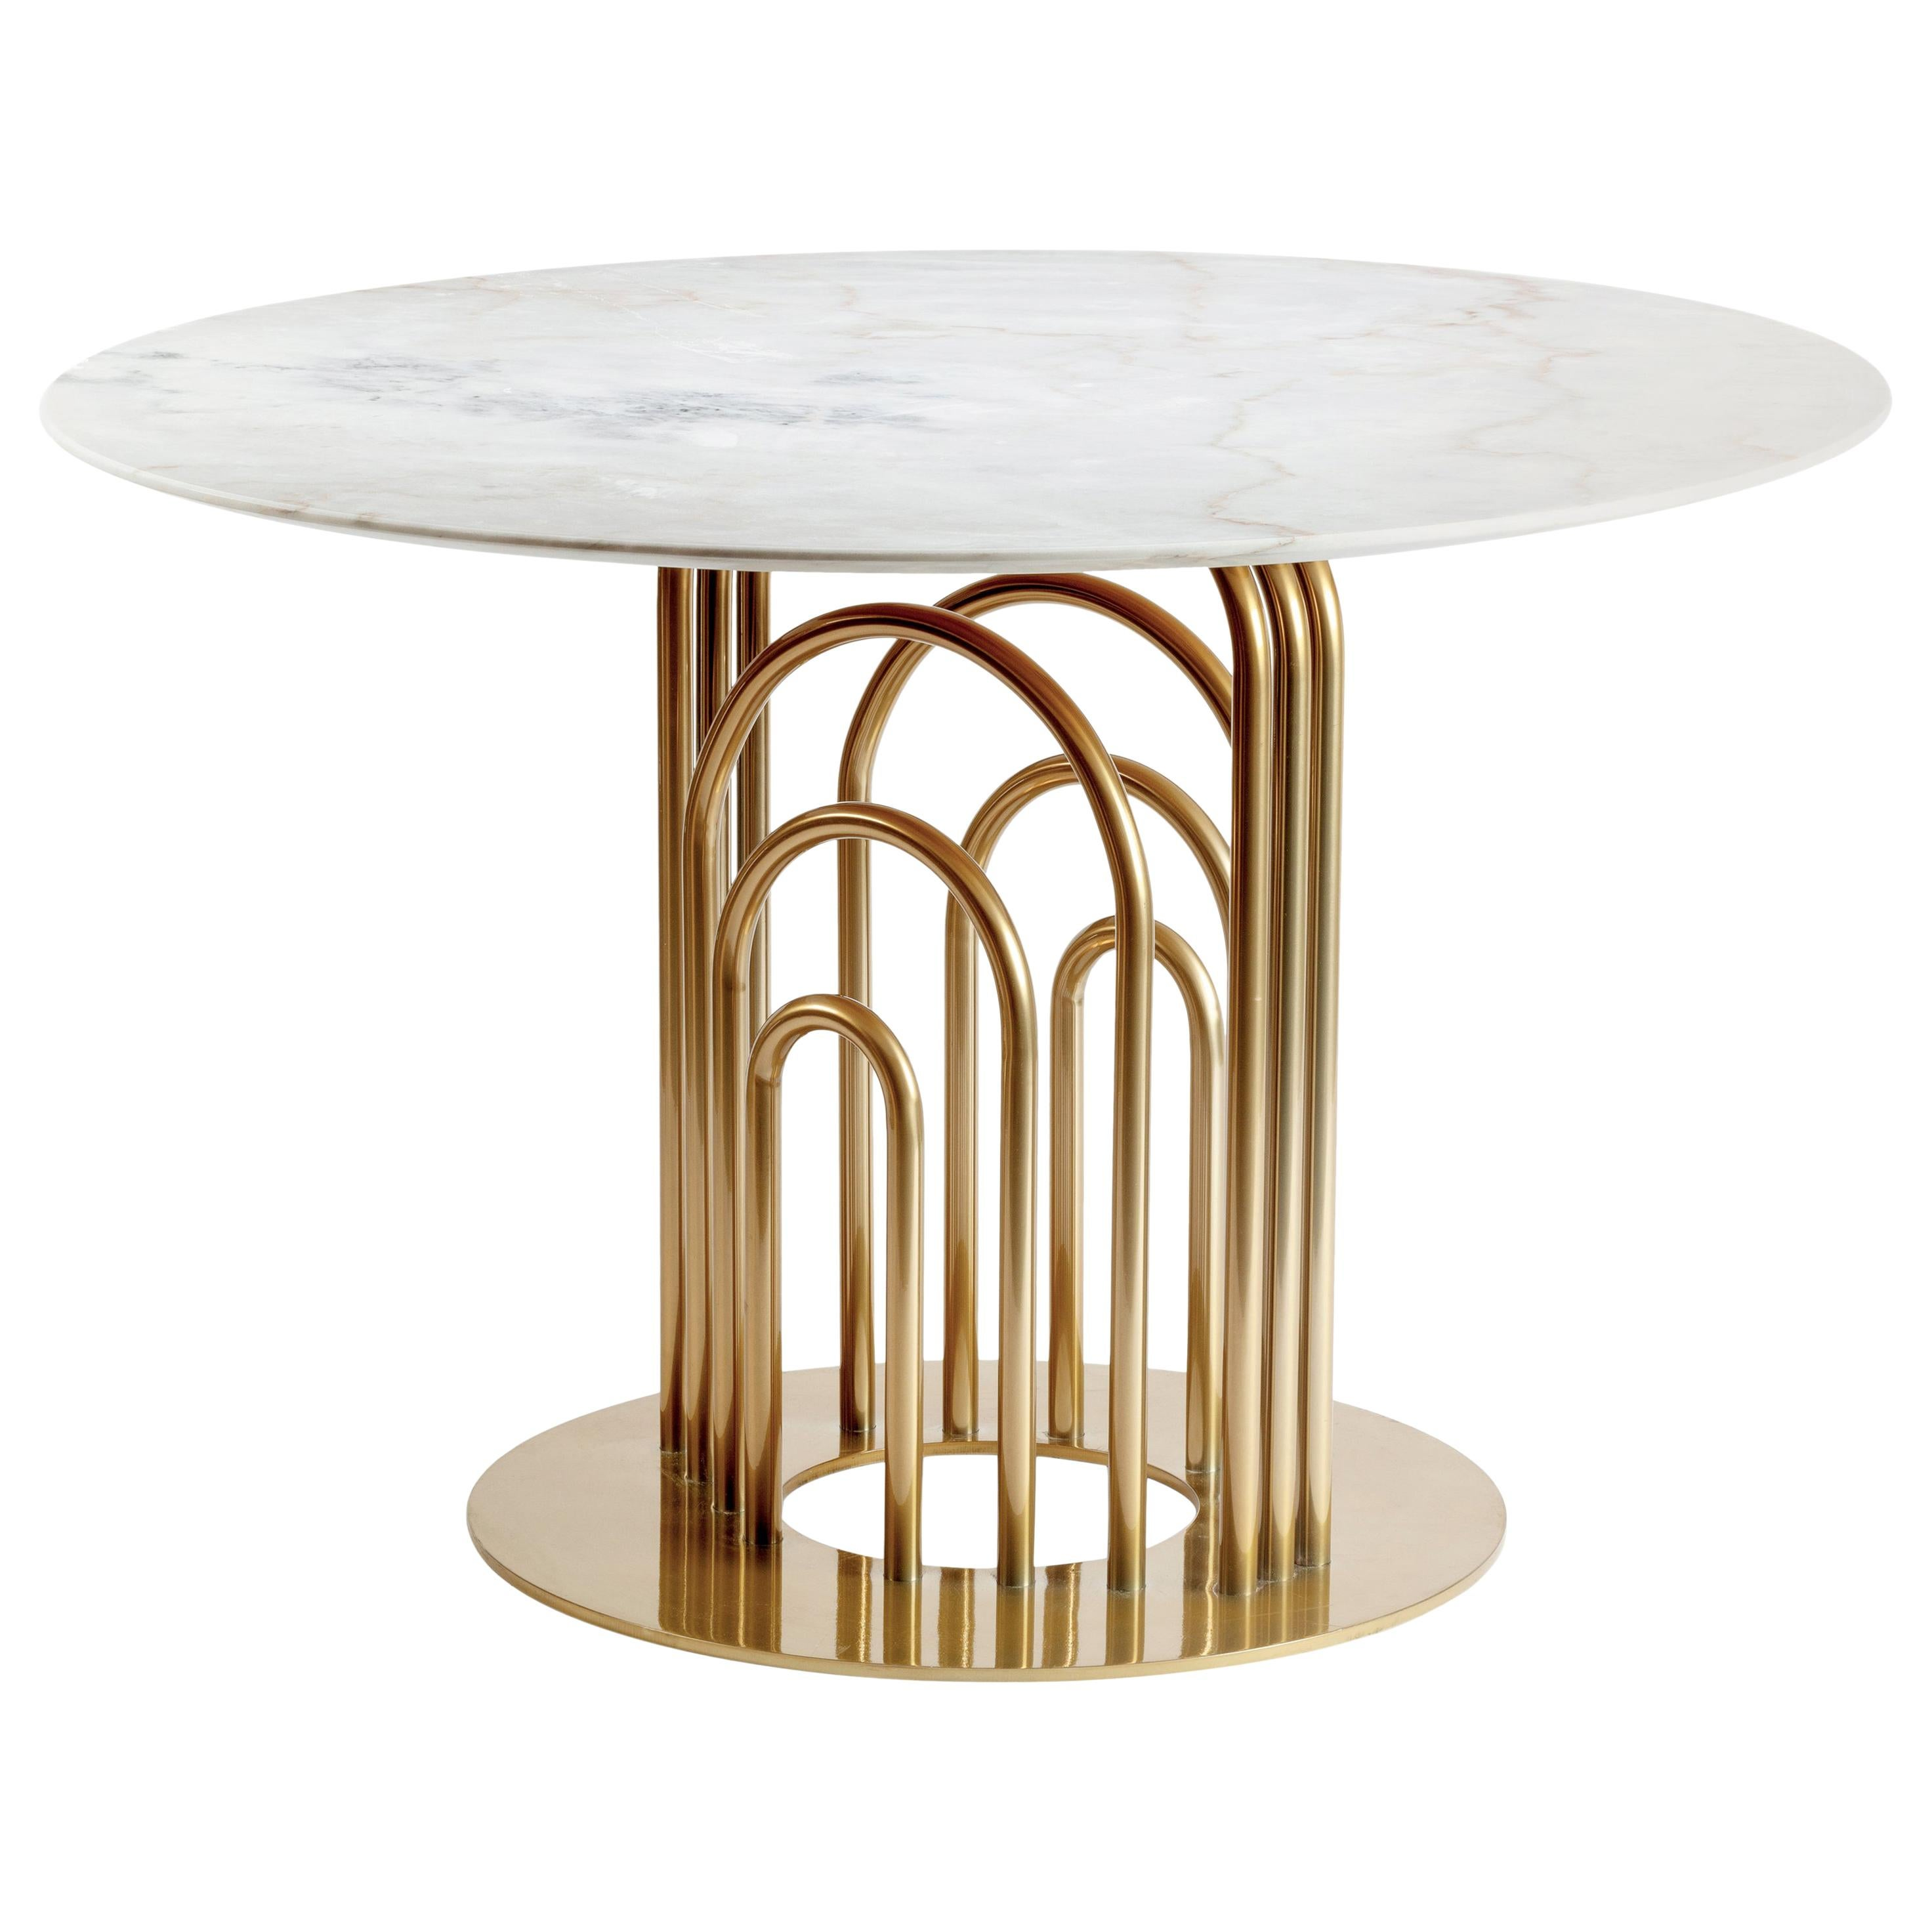 Brass and Marble Dinner Table Bara 150cm Ø